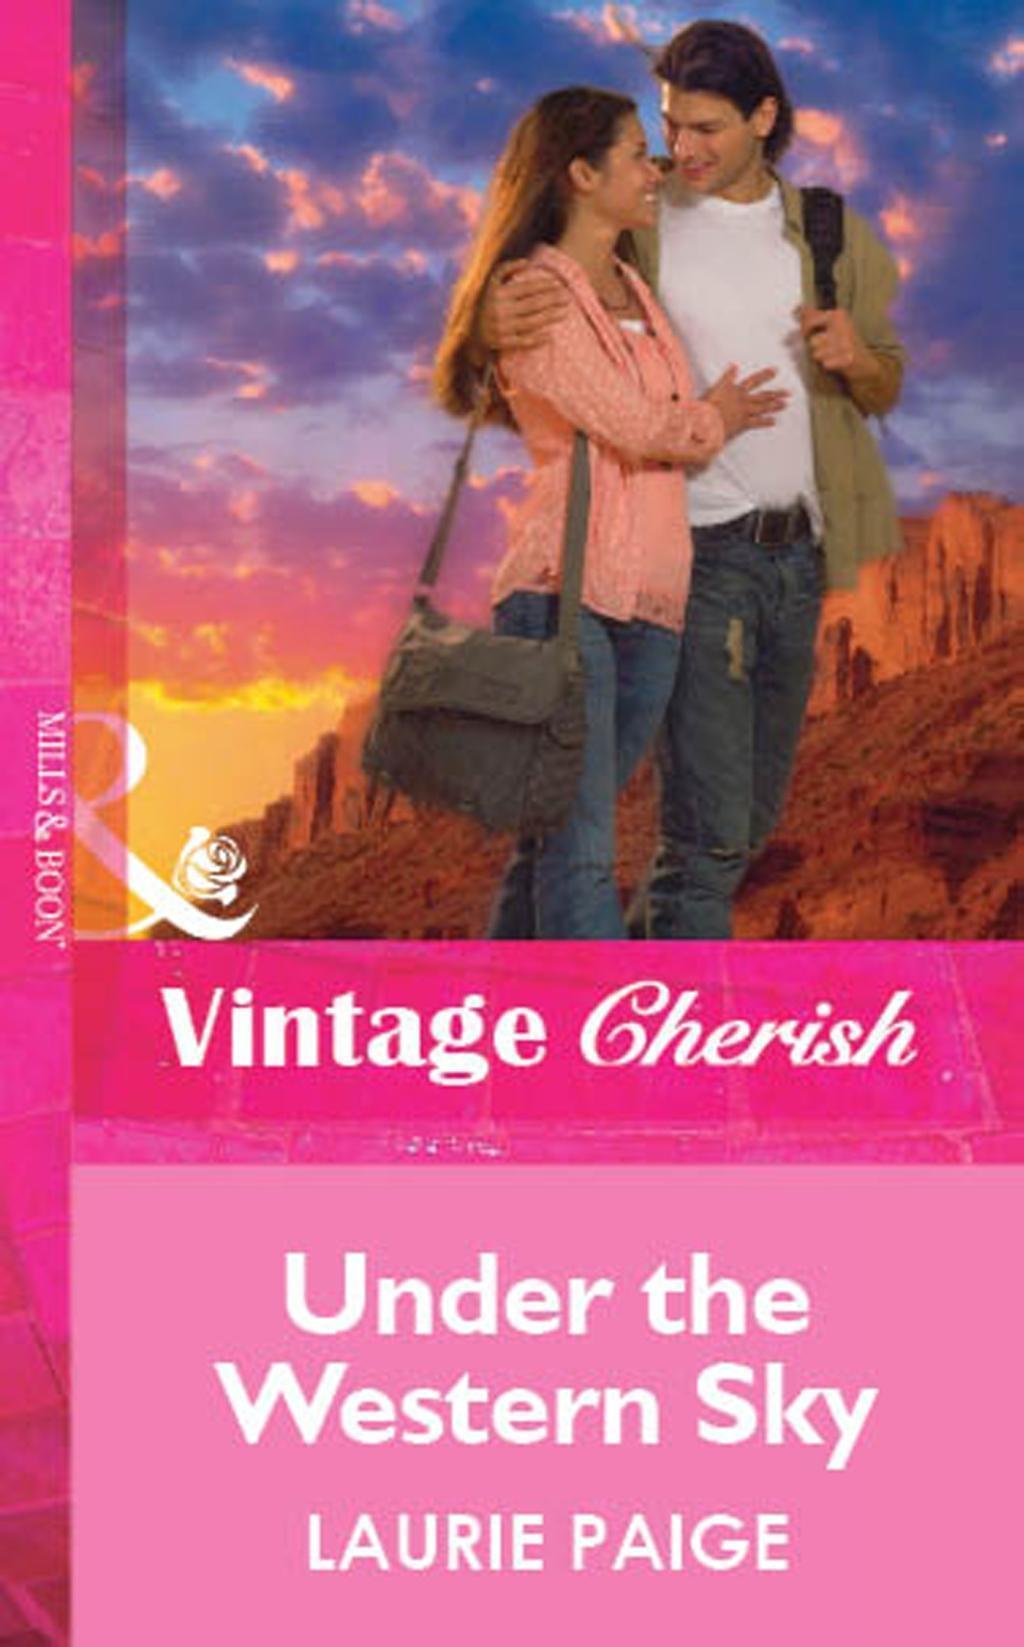 Under The Western Sky (Mills & Boon Vintage Cherish)